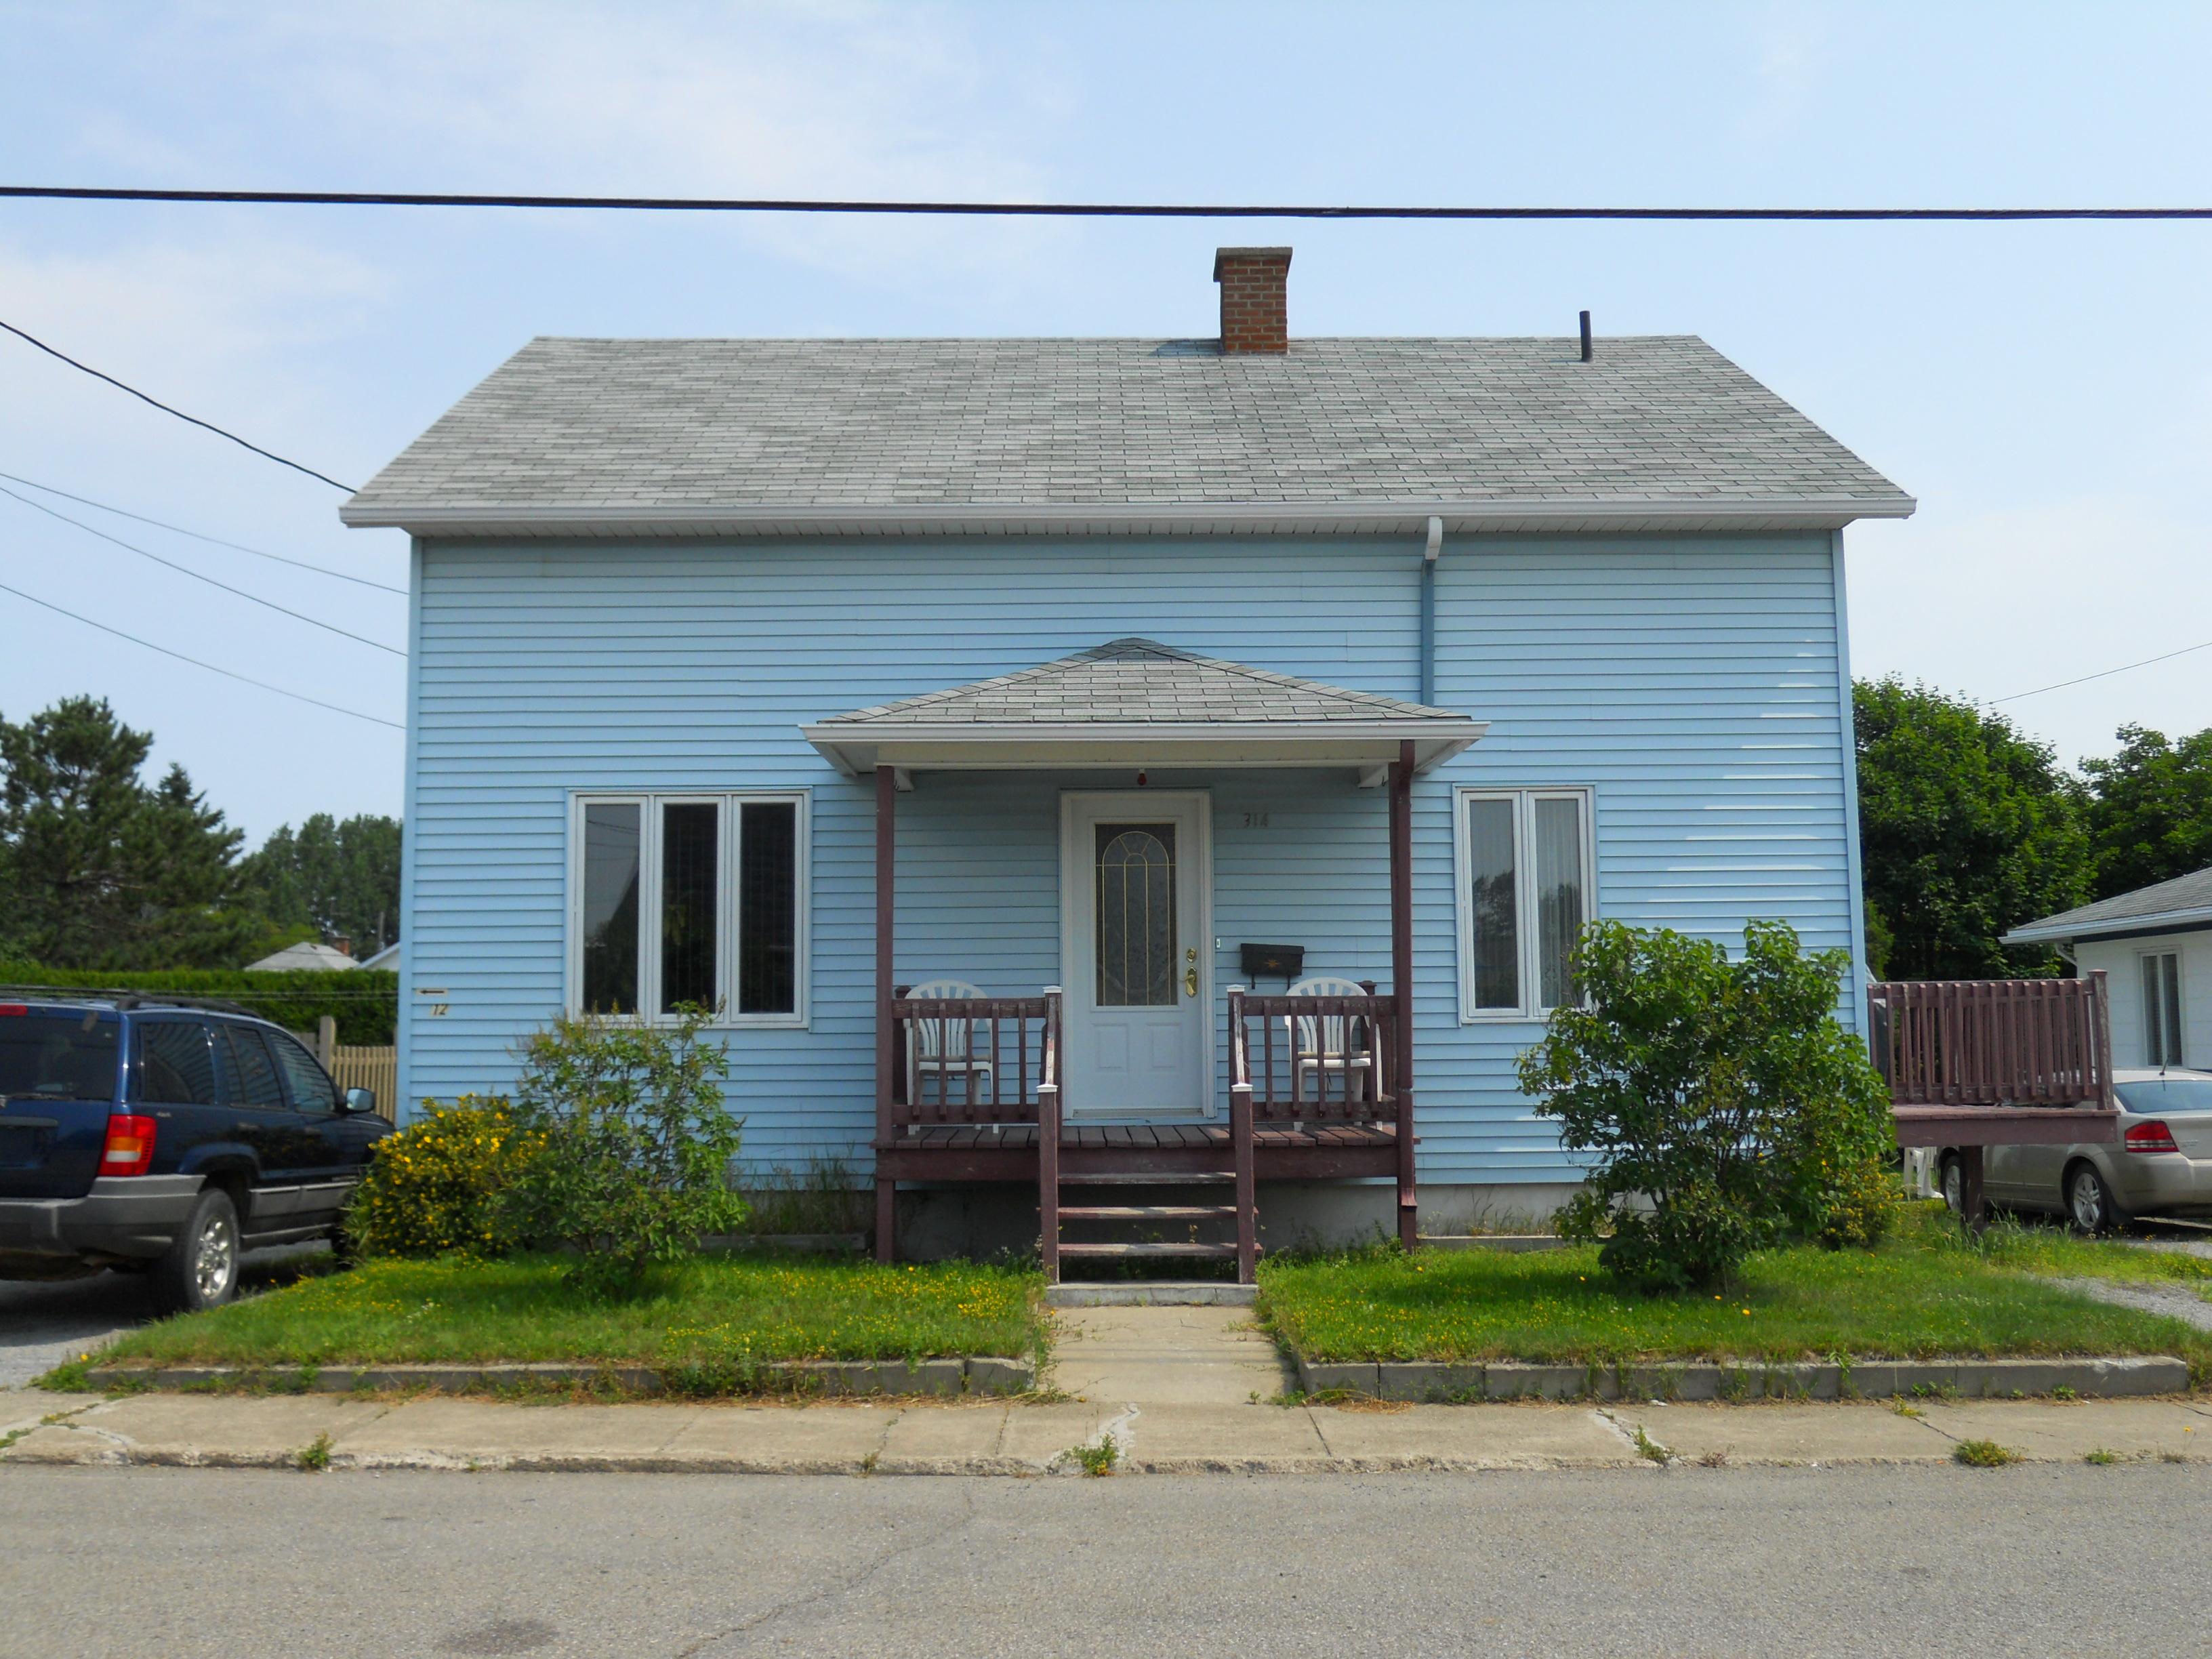 2020 - 312-314, rue Dollard Nord